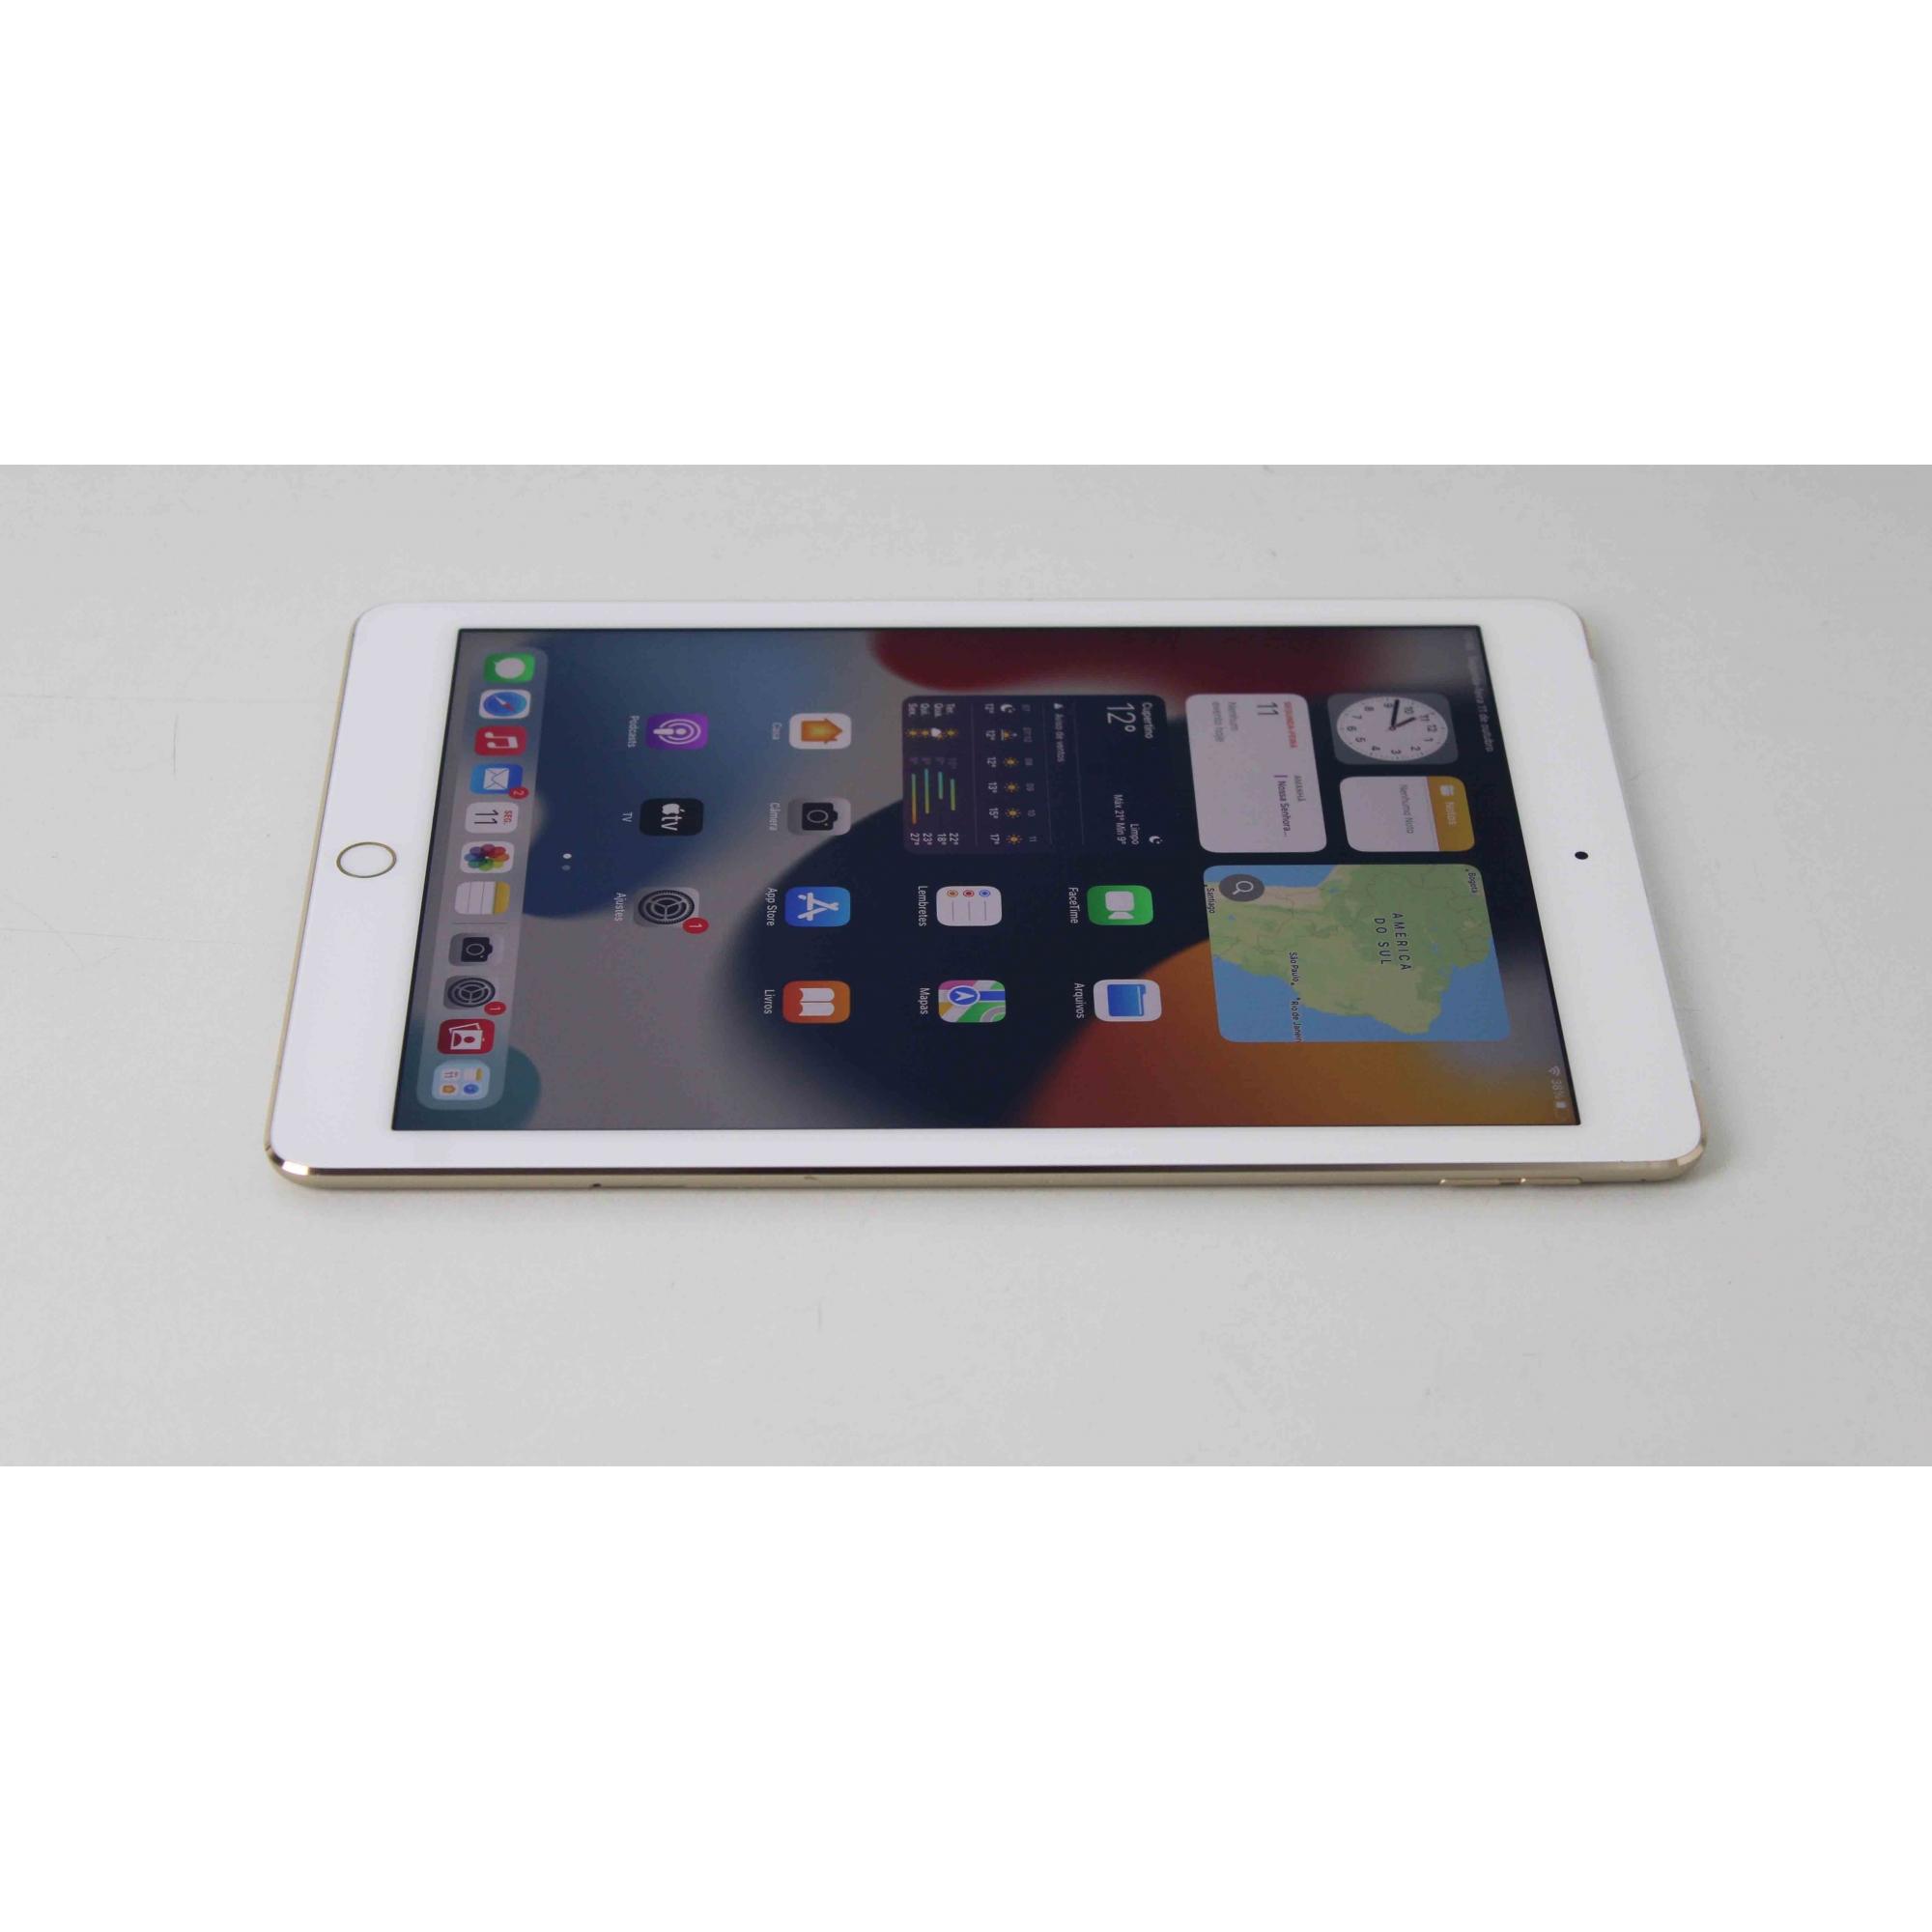 "iPad Air 2 MGHY2BR/A 9.7"" 64GB Wifi + 4G - Dourado"